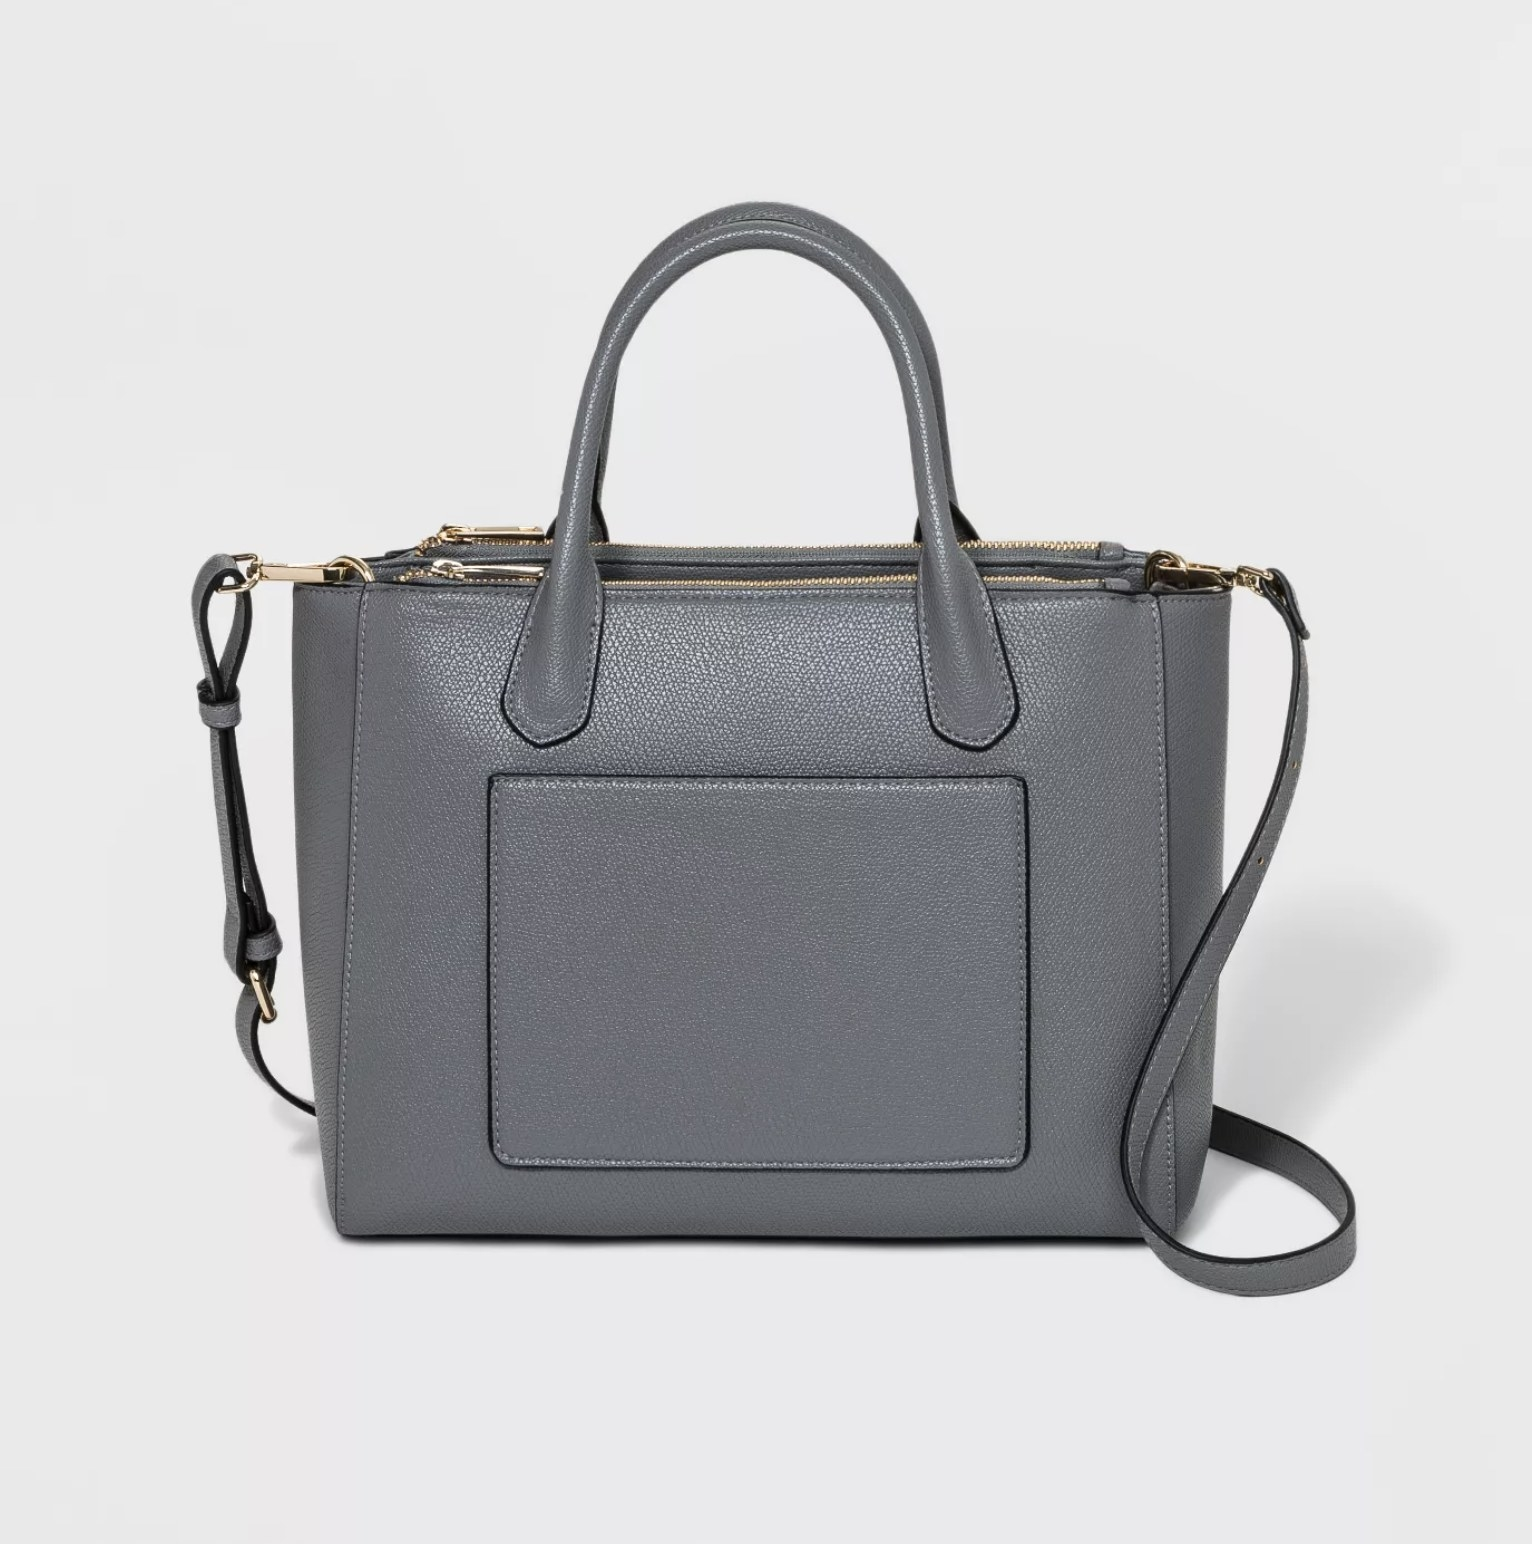 the gray satchel handbag